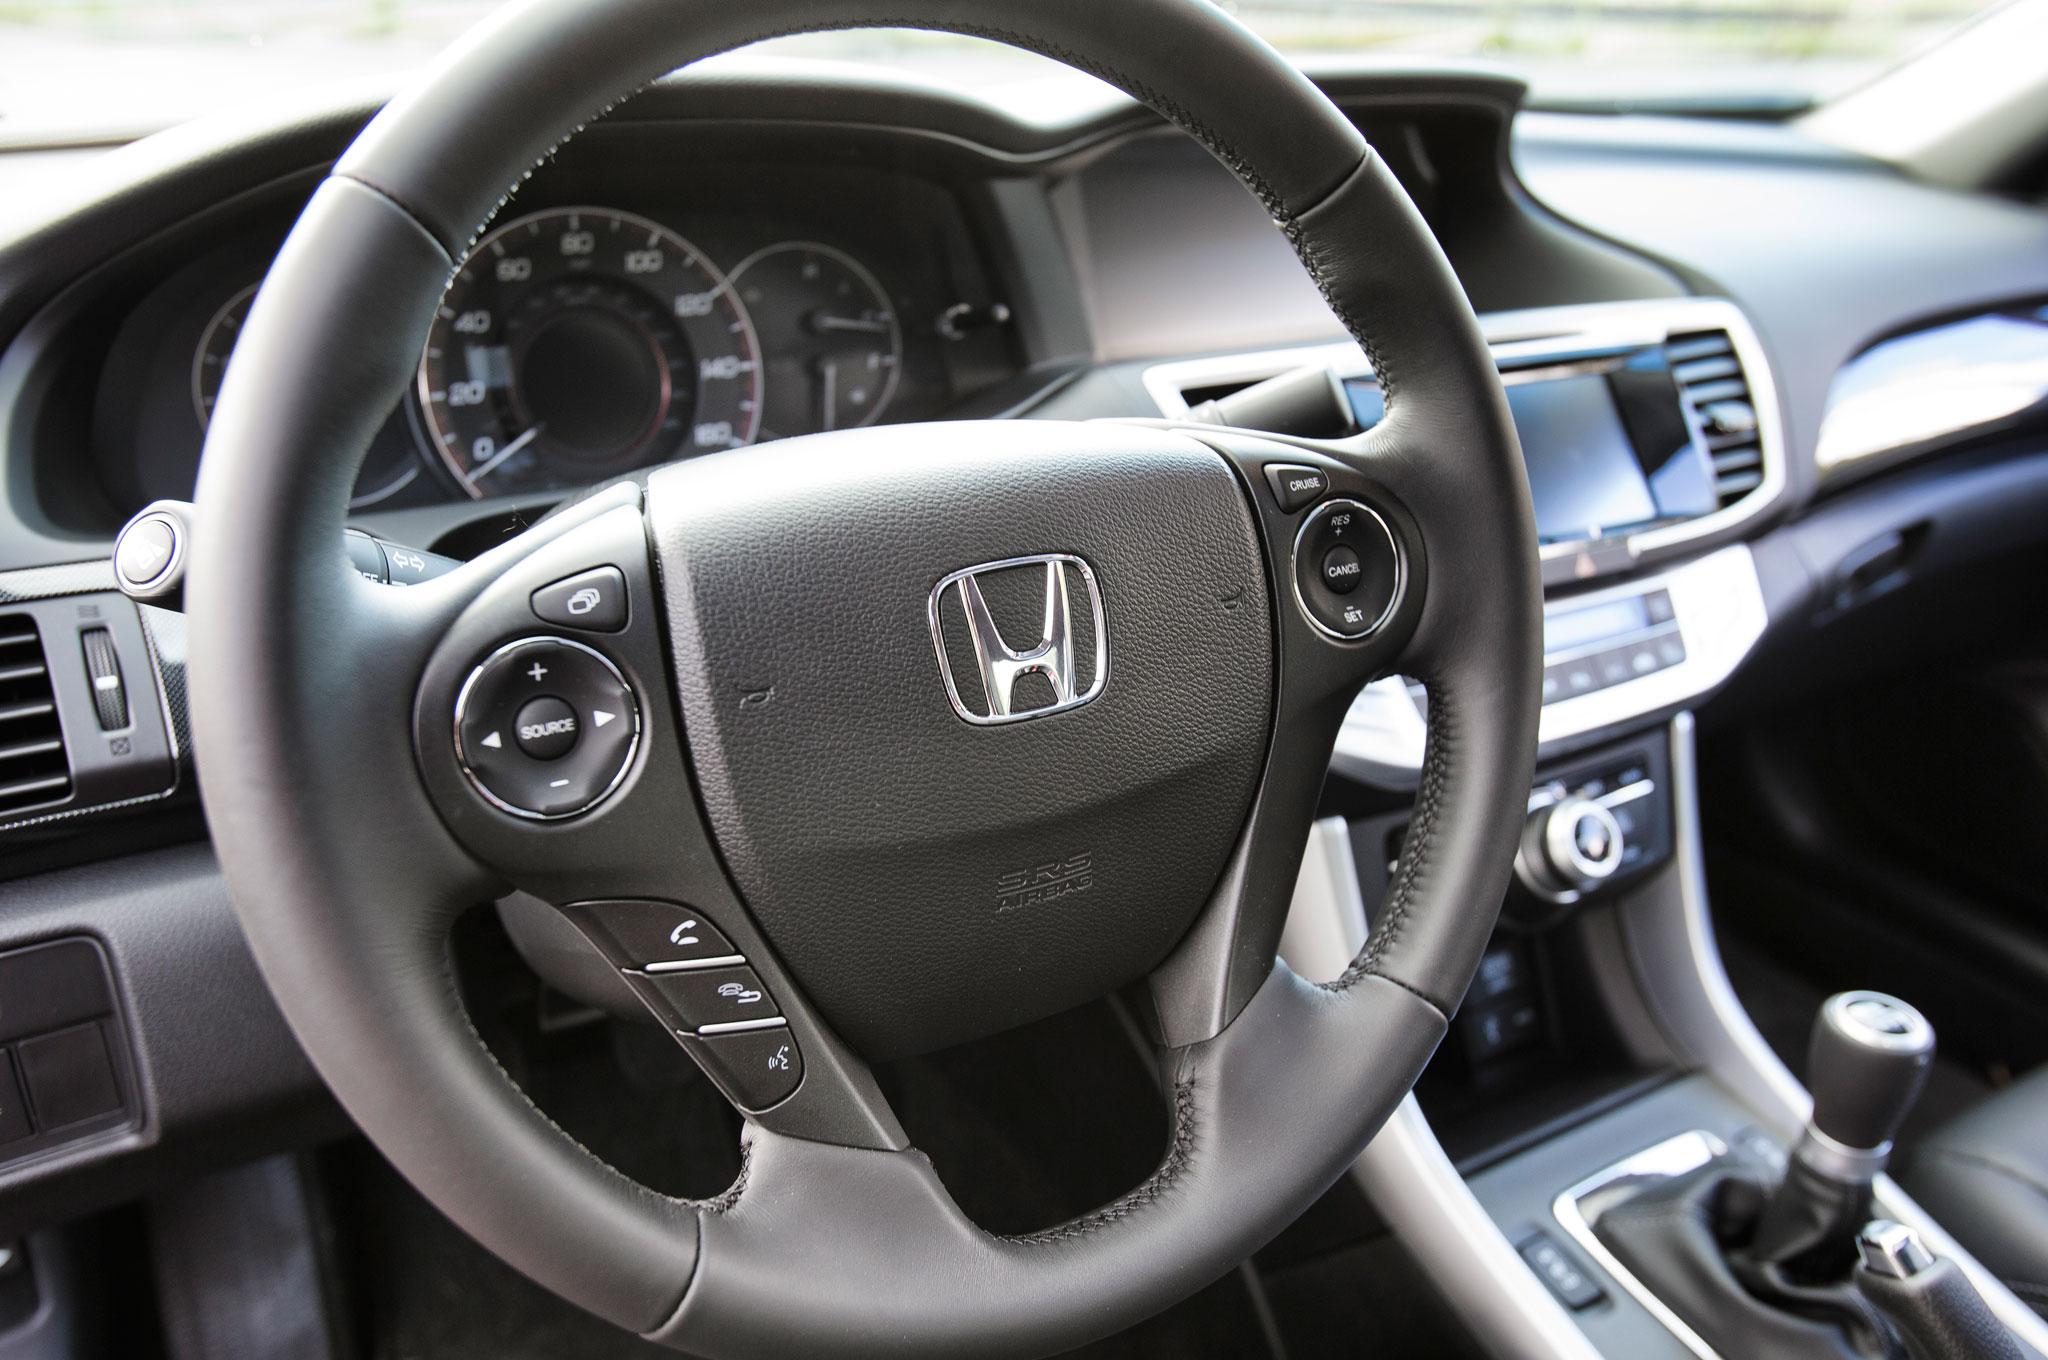 2007 honda accord coupe ex-l v6 review